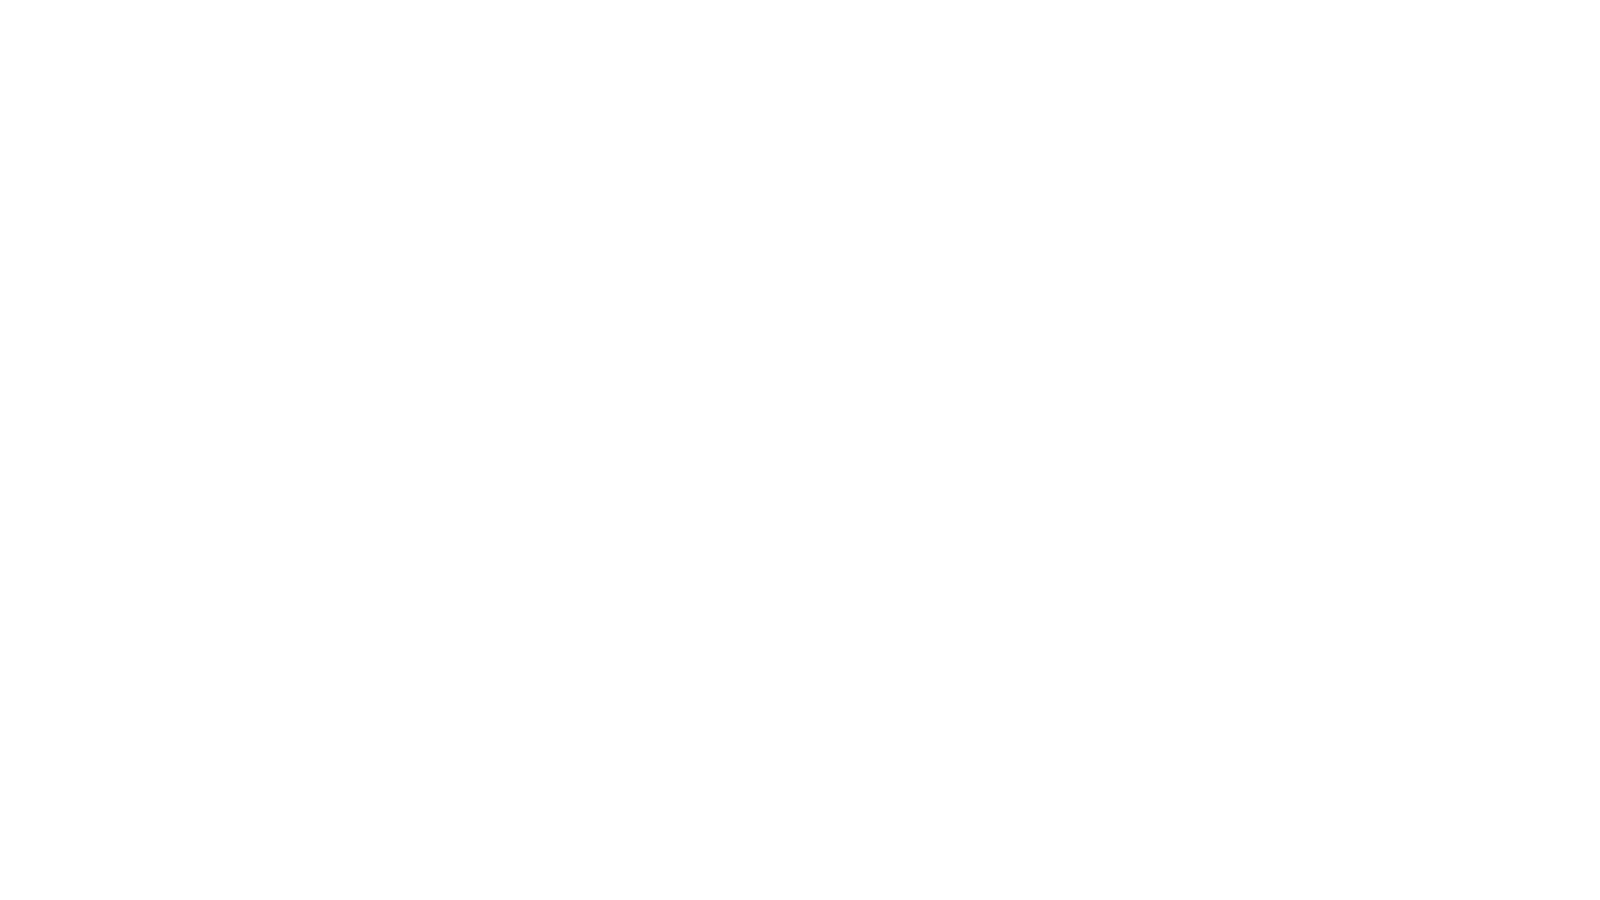 Bon biní na e sirbishi di Iglesia E Porta.  Nos ta invitabo pa sigi nos otro sirbishinan via livestream. Nos edifisio tambe ta habrí.  📅 Nos sirbishinan tin e siguiente orarionan: Djadumingu mainta 11 or  Djadumingu atardi 6 or  Djarason anochi 7:30 or  contact: Iglesiaeporta.com  Pasa serka nos na Piscaderaweg 8  Pastor Lindon & Adillée Marselia